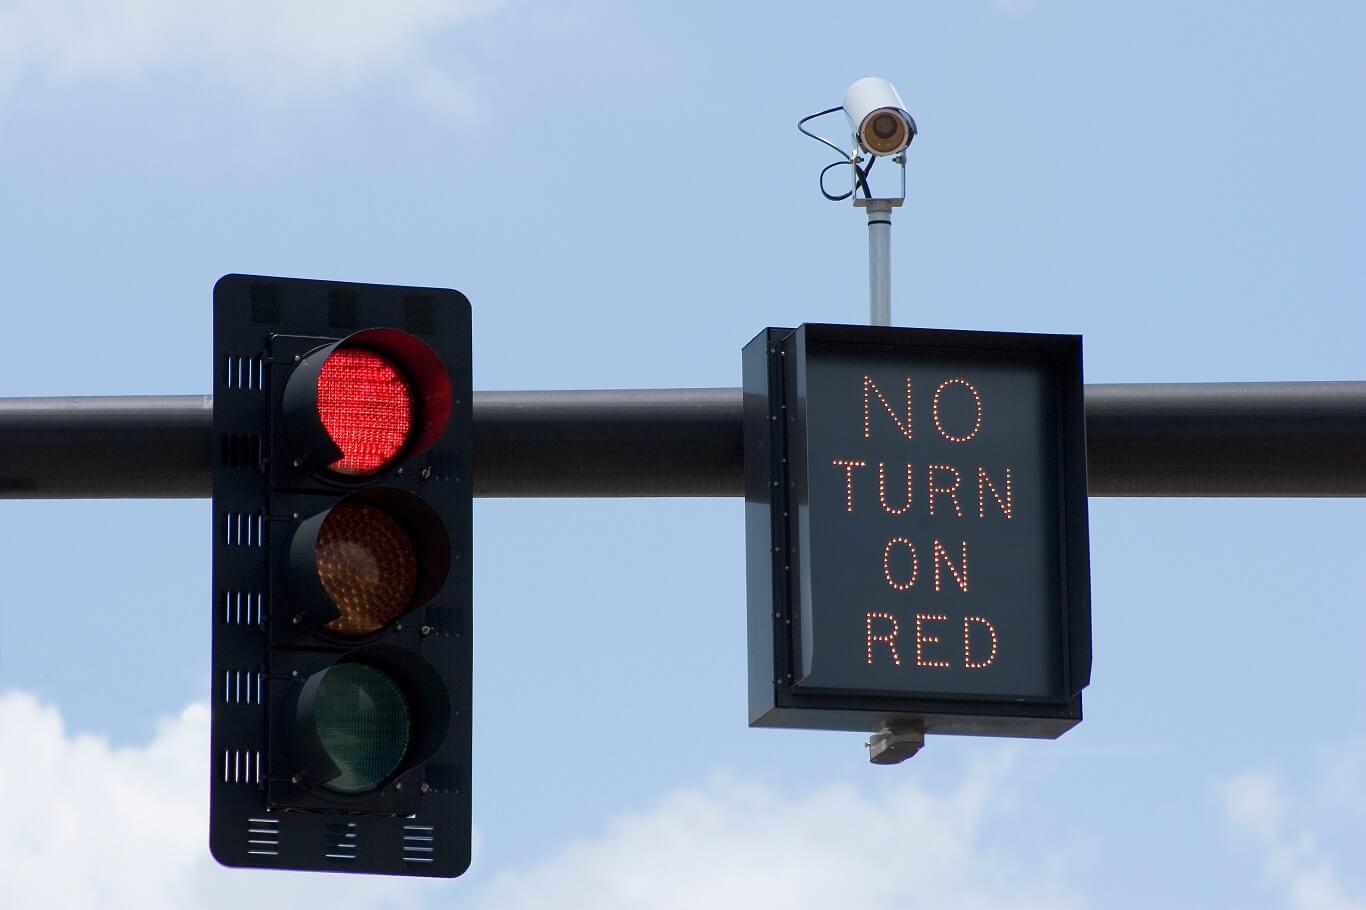 Are traffic cameras legal